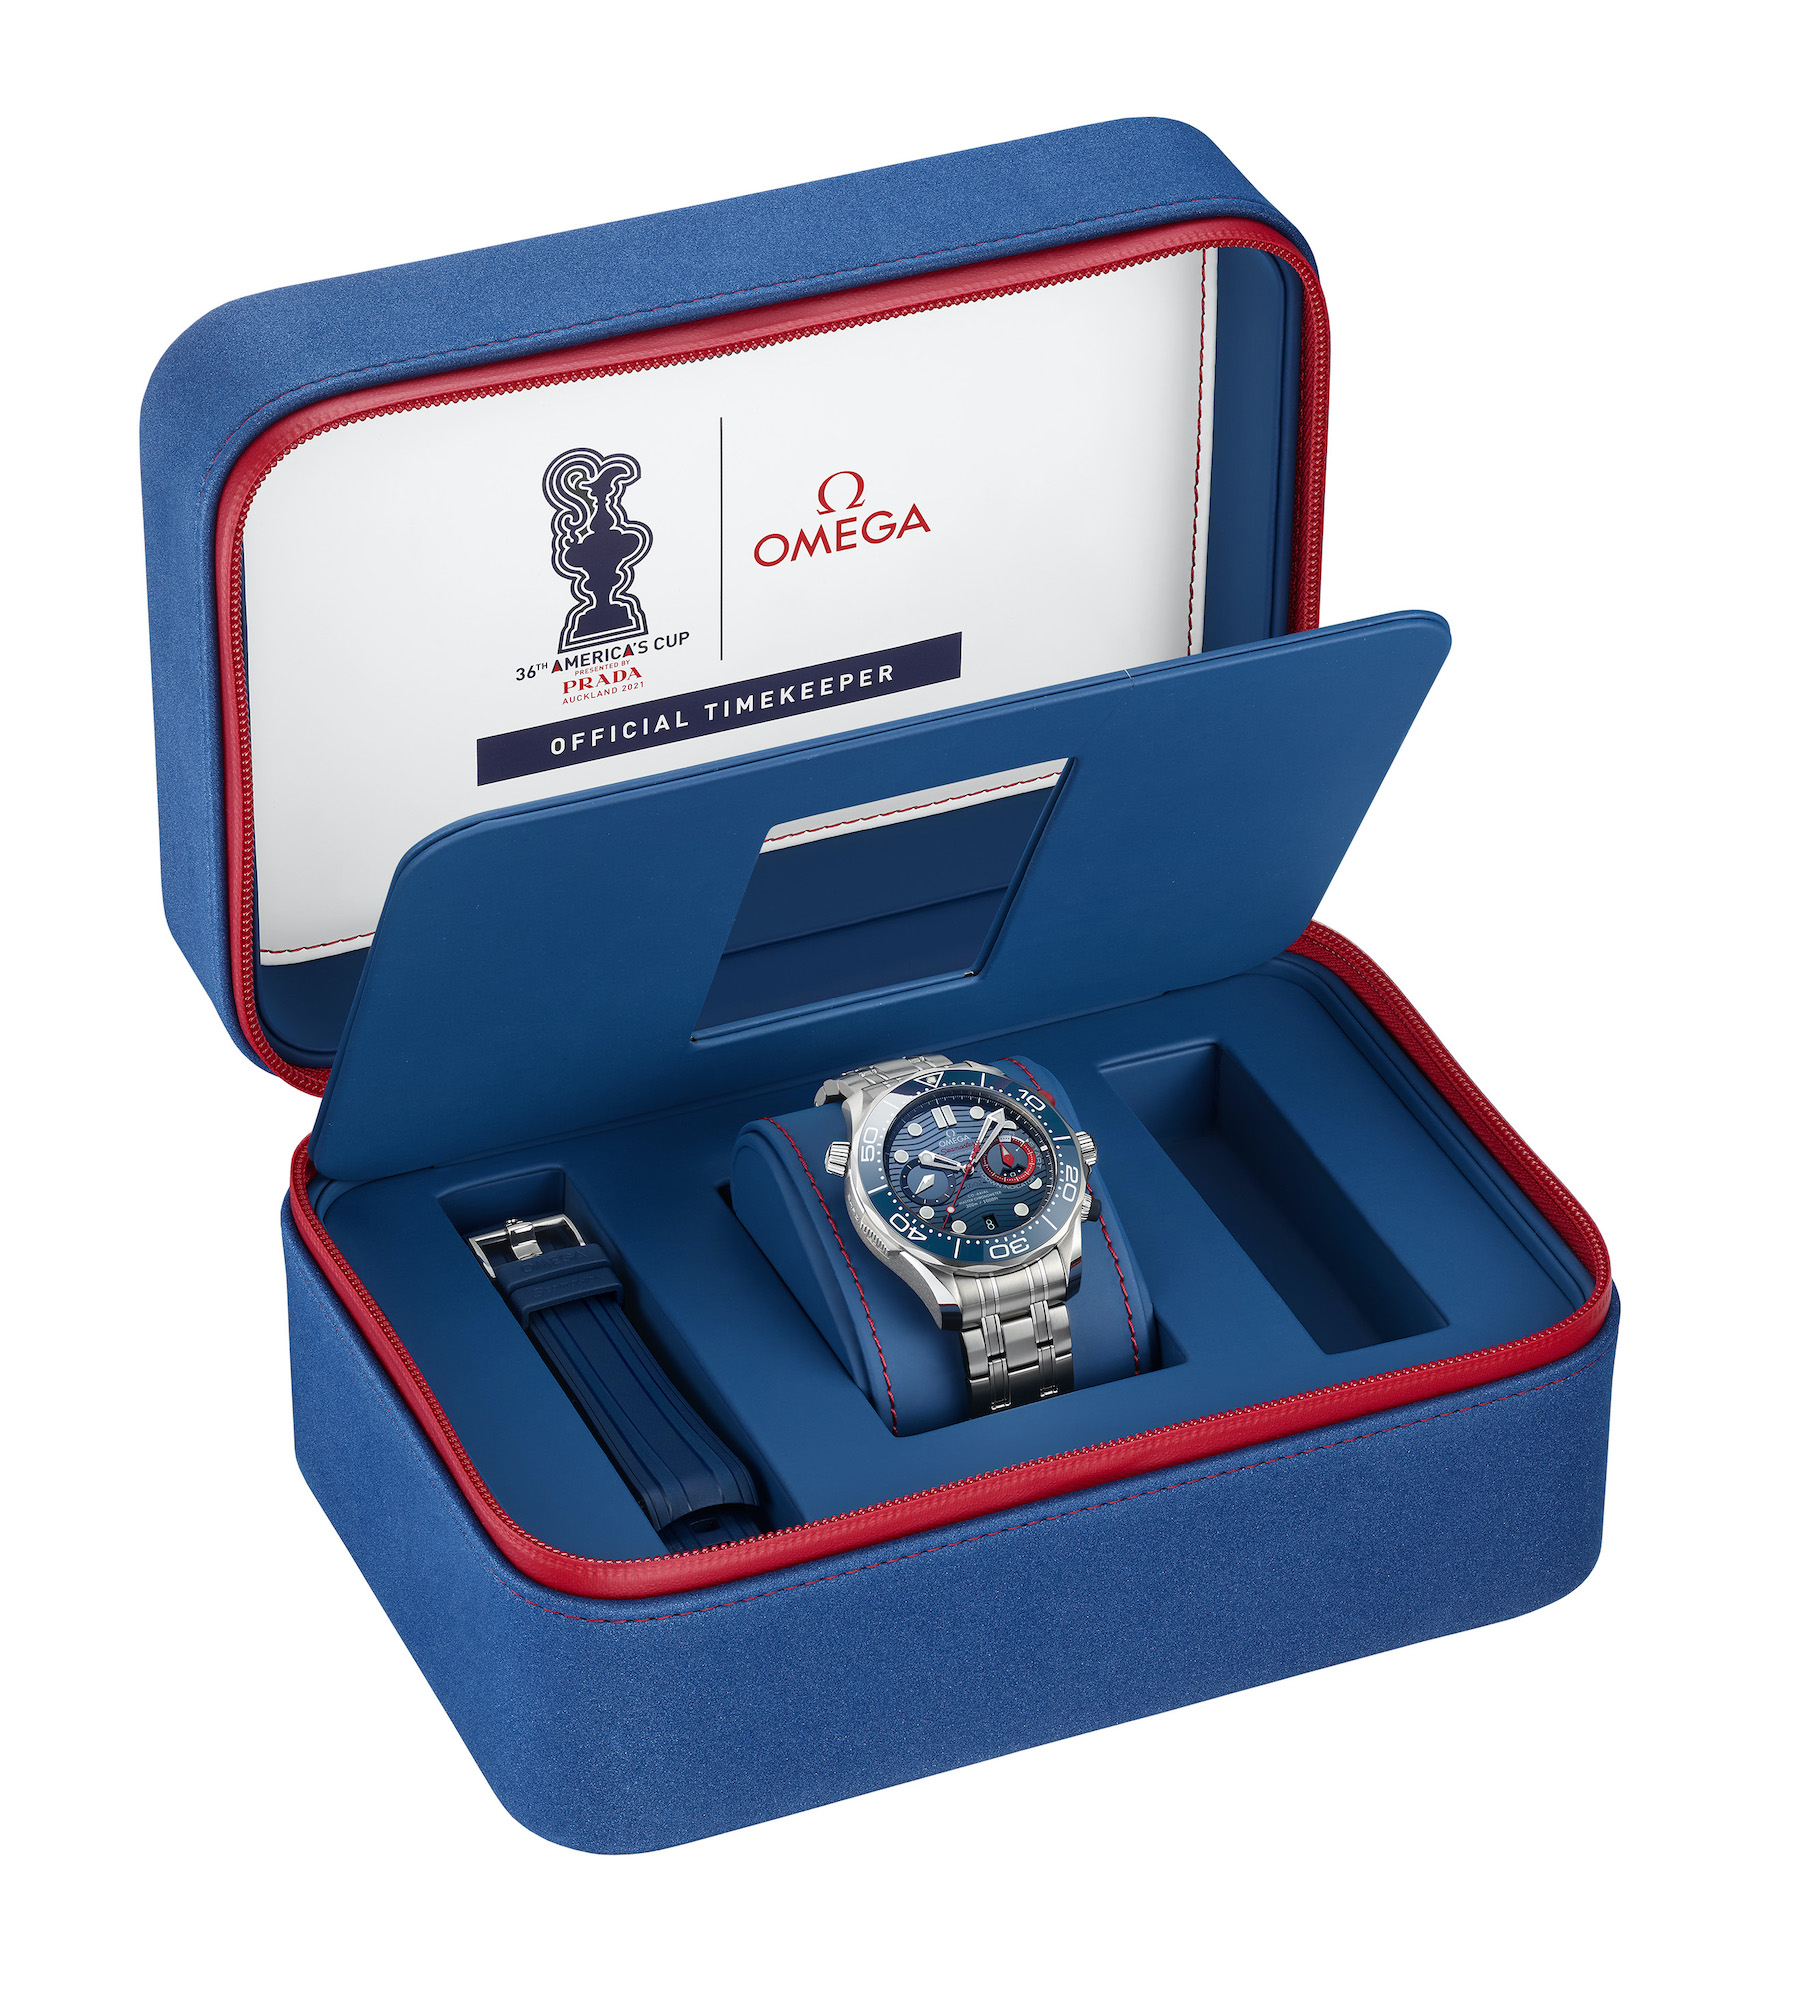 Omega Seamaster Diver 300M Americas Cup Chronograph 210.30.44.51.03.002 Estuche